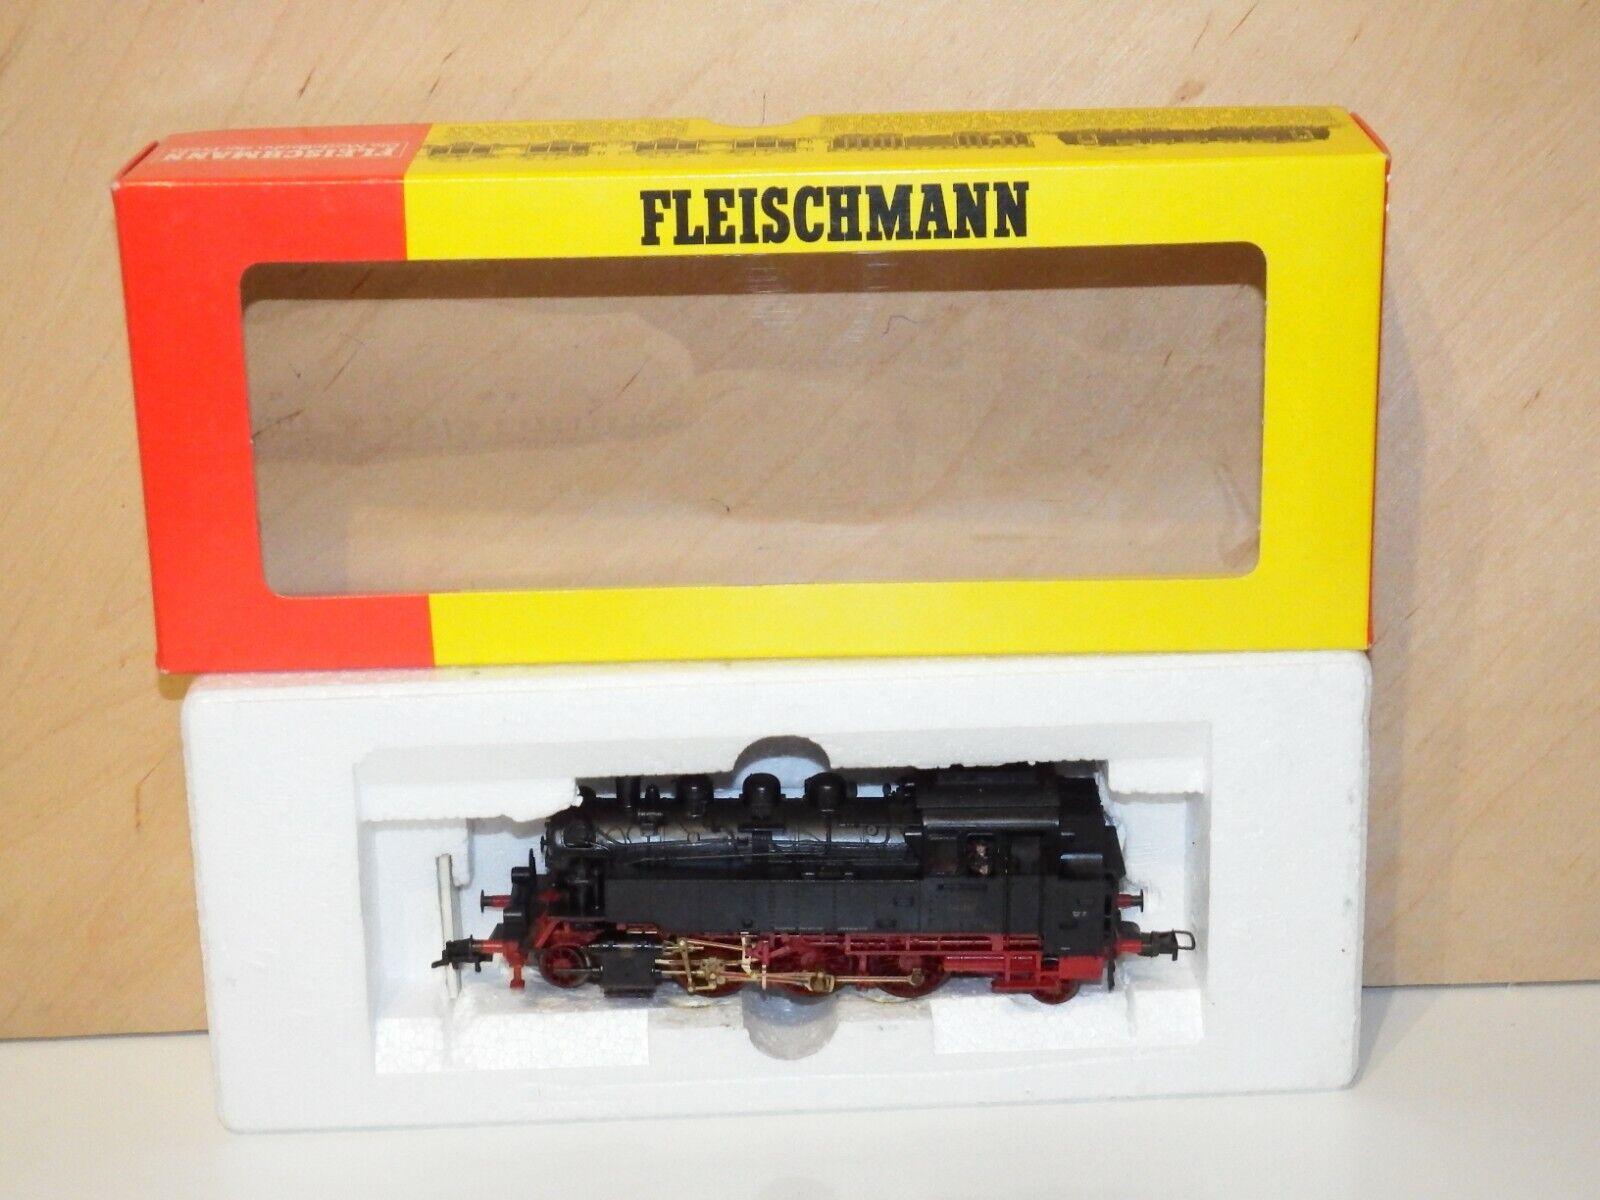 H0 Fleischmann 4063 Locomotora de Vapor Dr Br 64 387 Emb.orig 8580